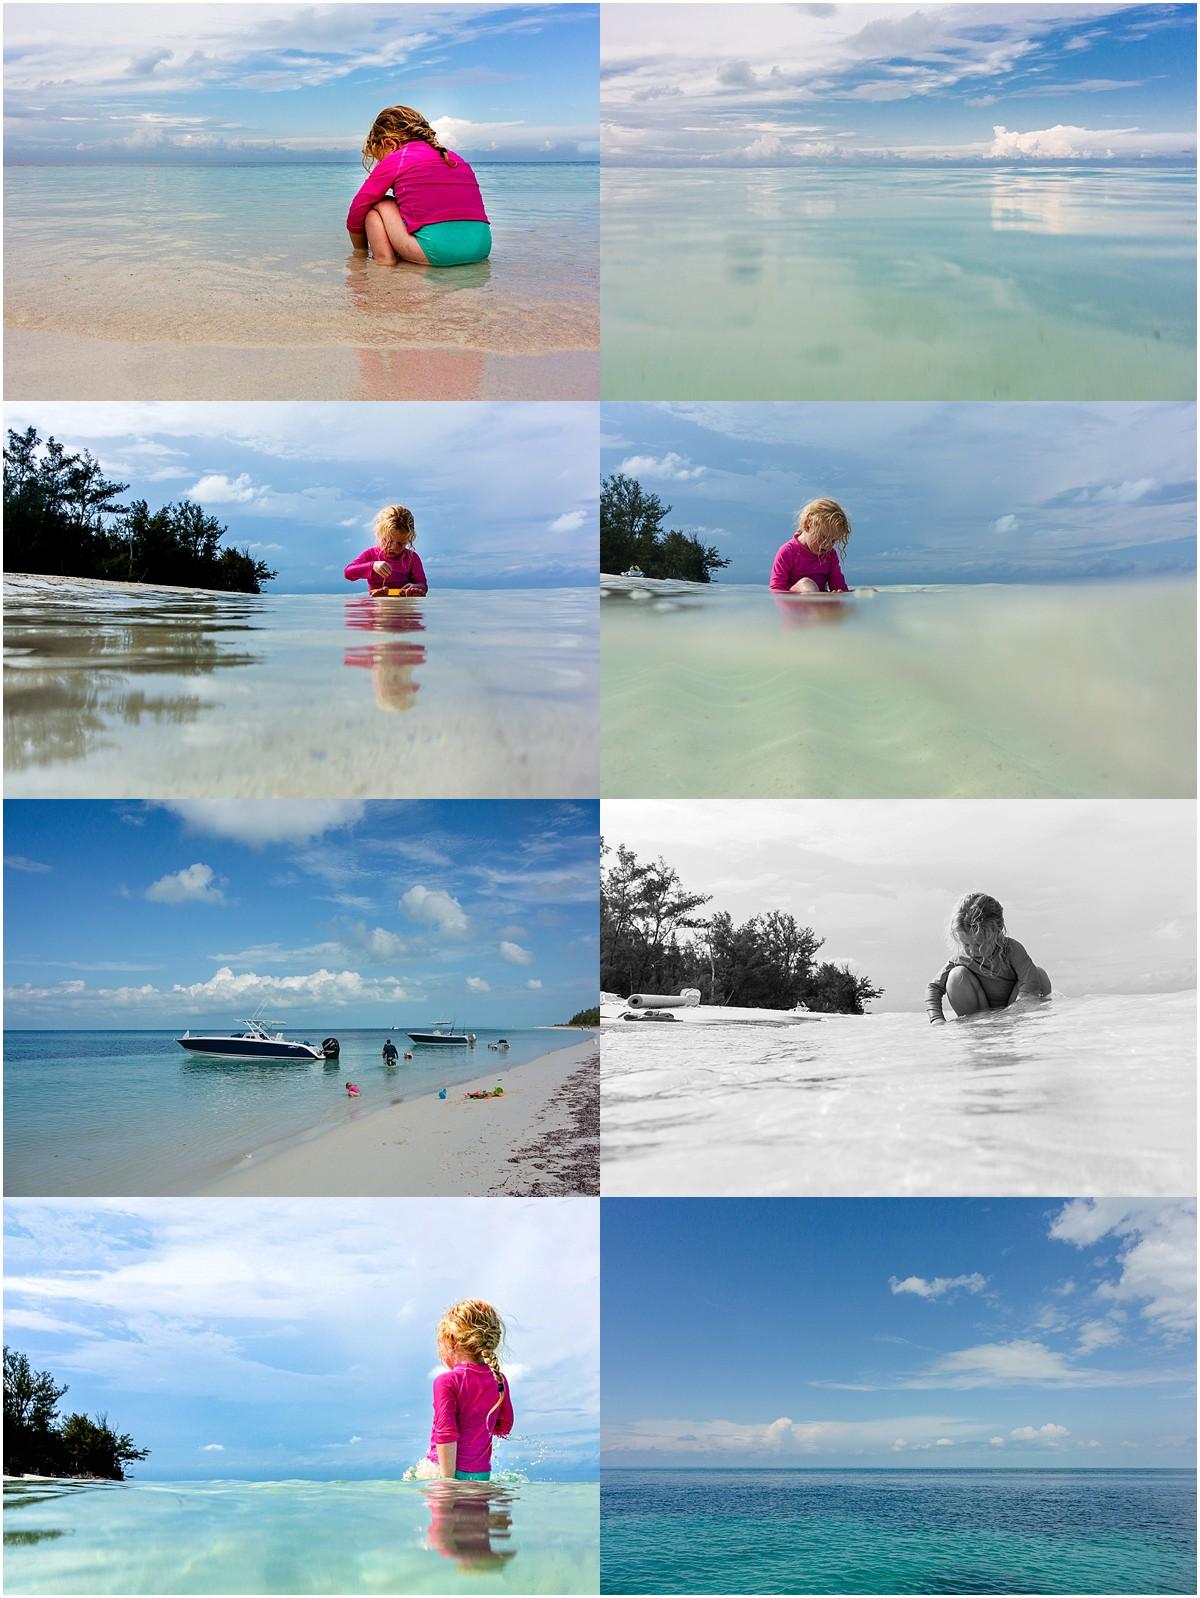 Ashley_Rogers_Photography_South_Florida_Photographer_Orlando_Photographer_Costa_Rica_Photographer_0776.jpg